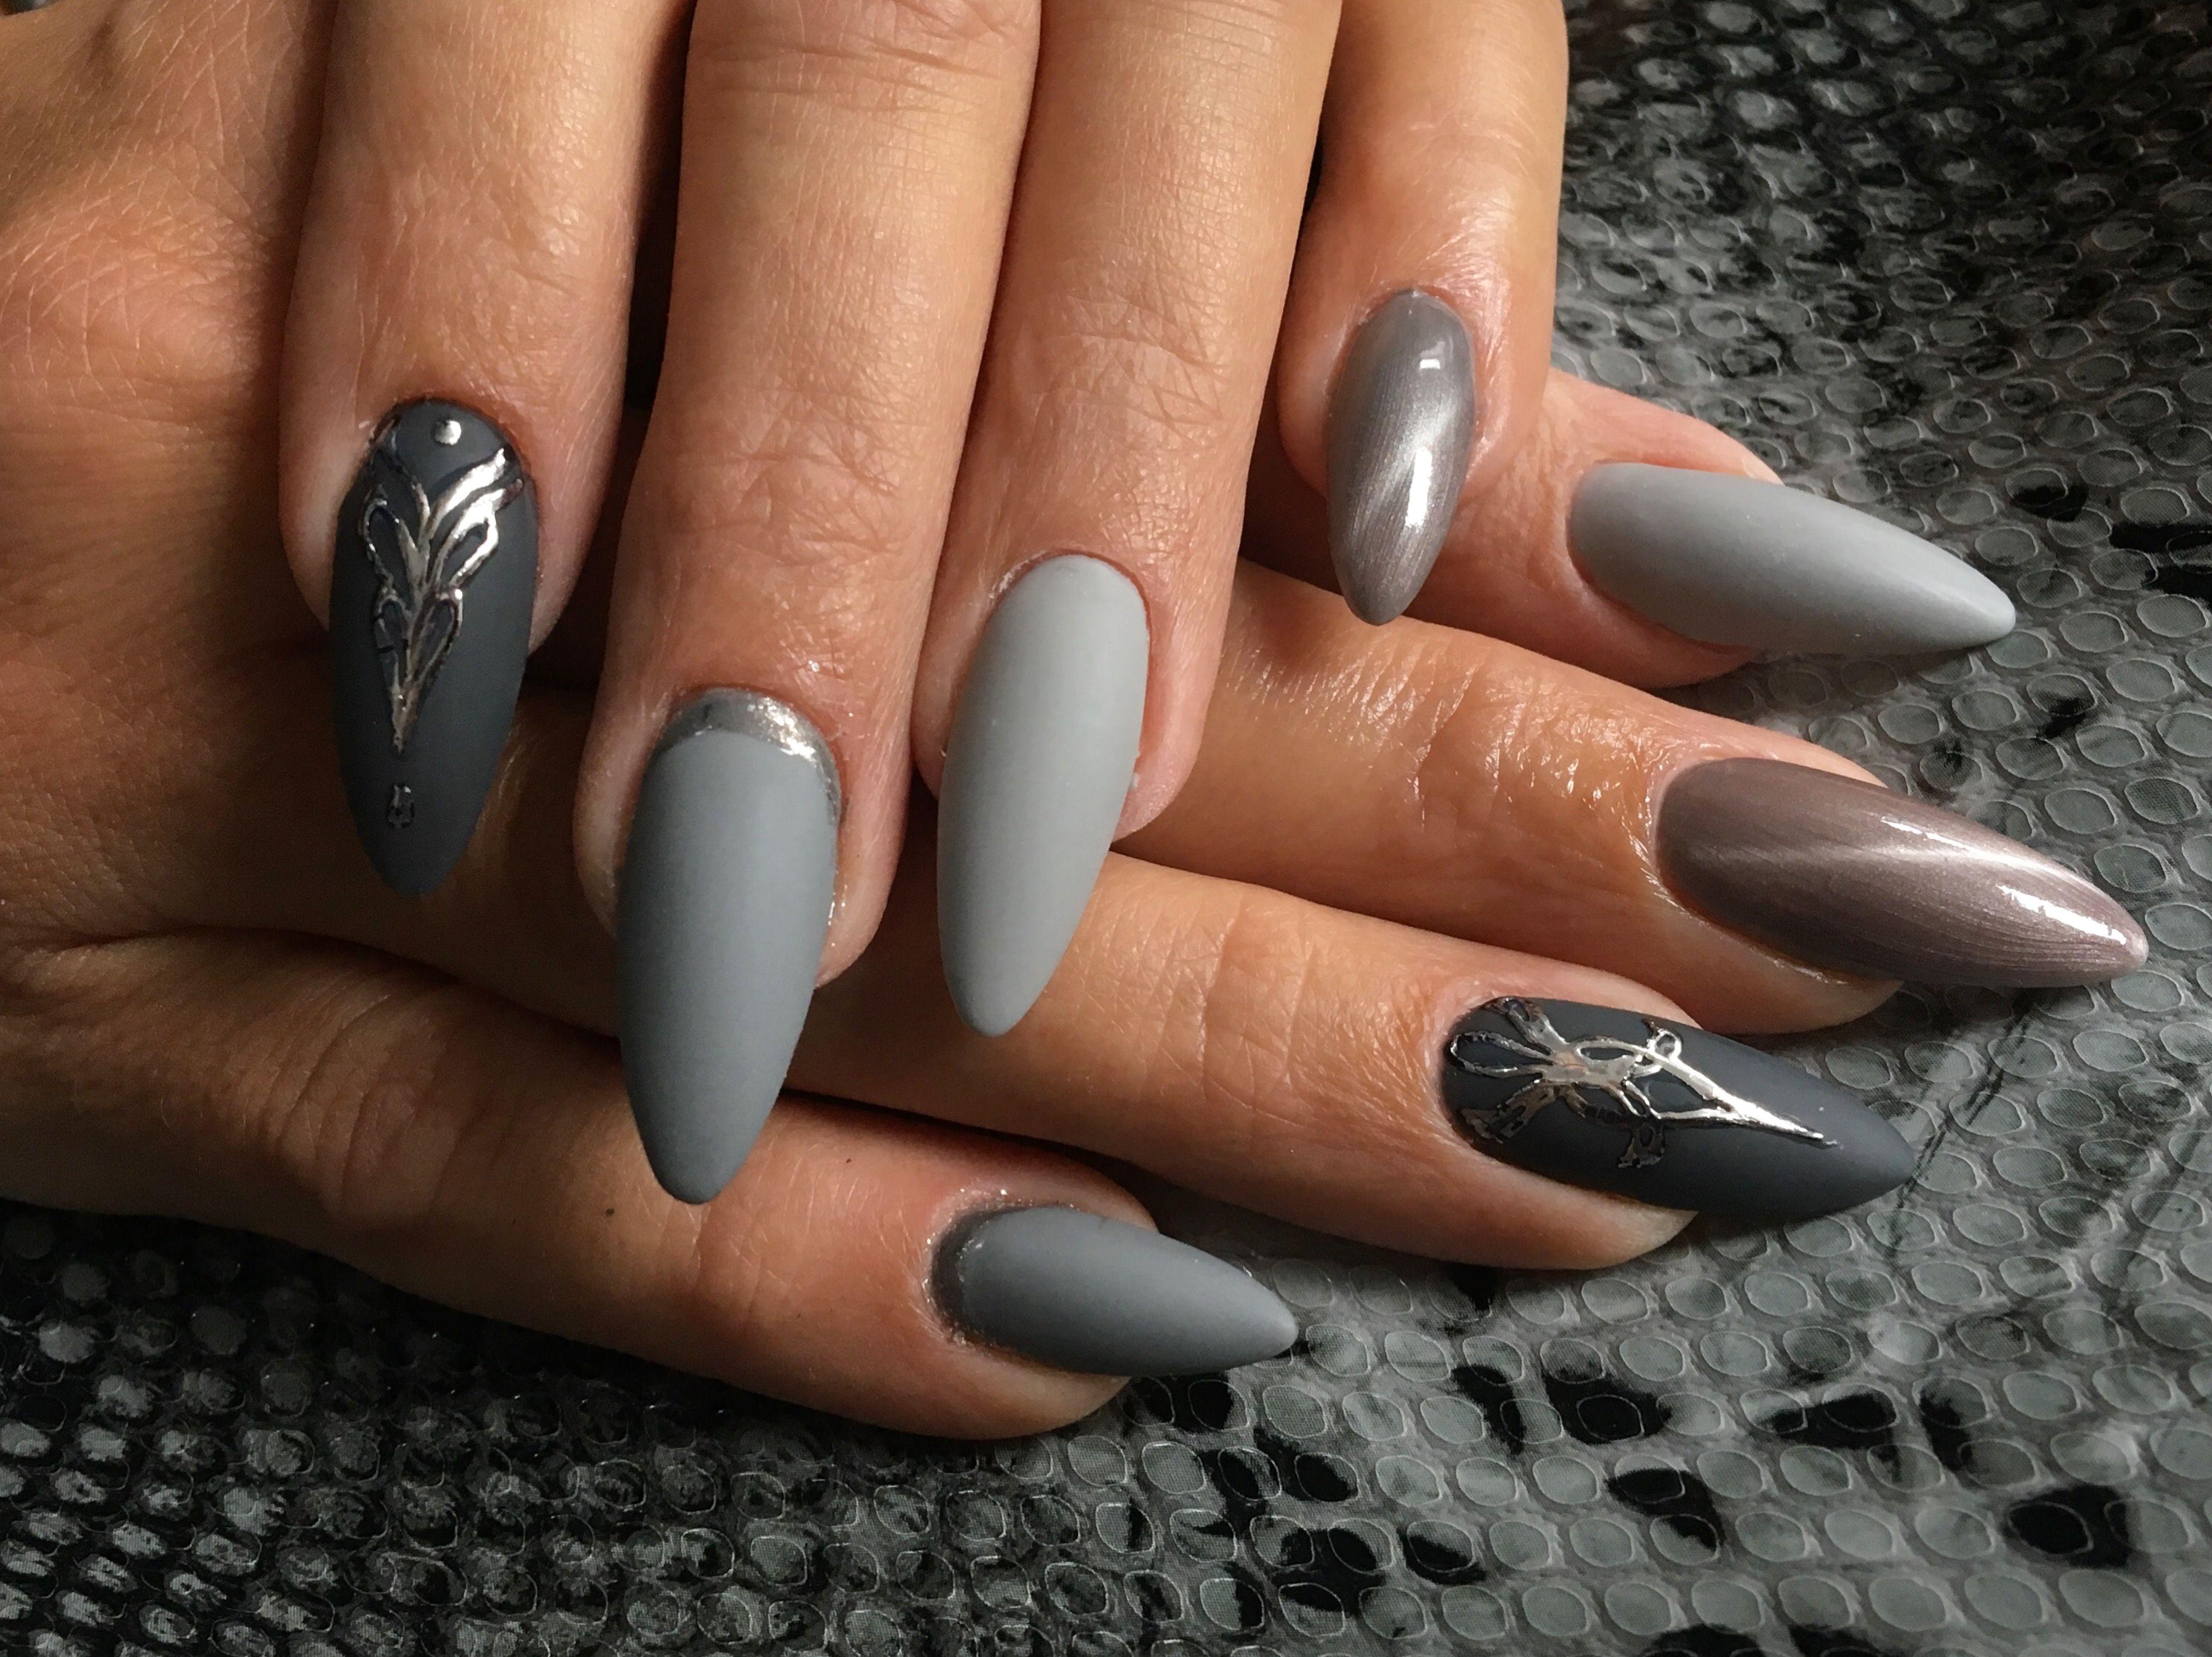 Pin by Aneta Jeleń on @miss_deer_nails | Pinterest | Deer nails